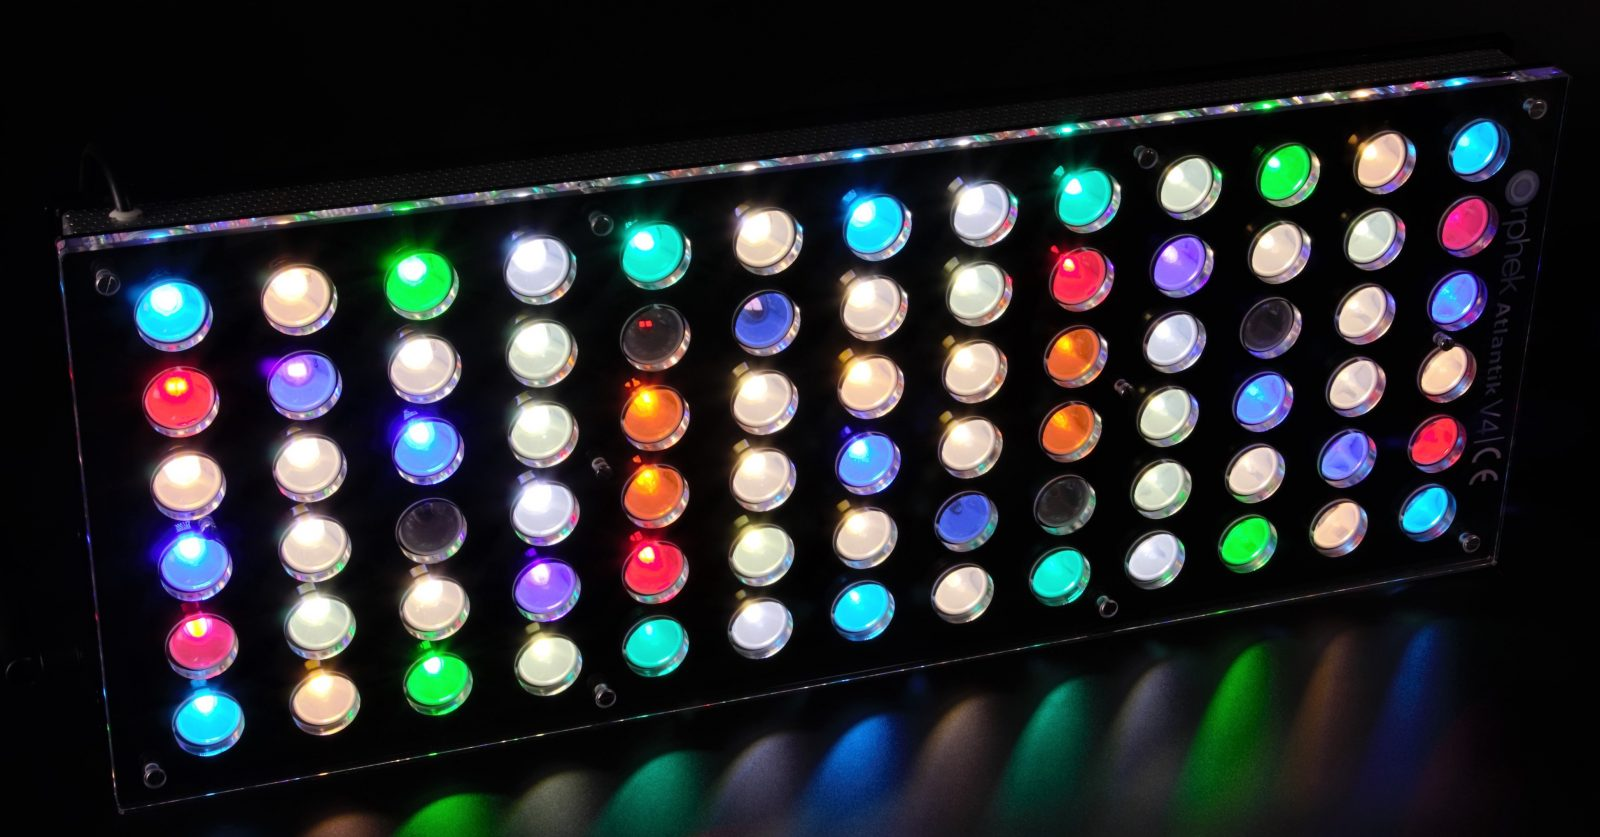 bedste LED akvarium lys 2020